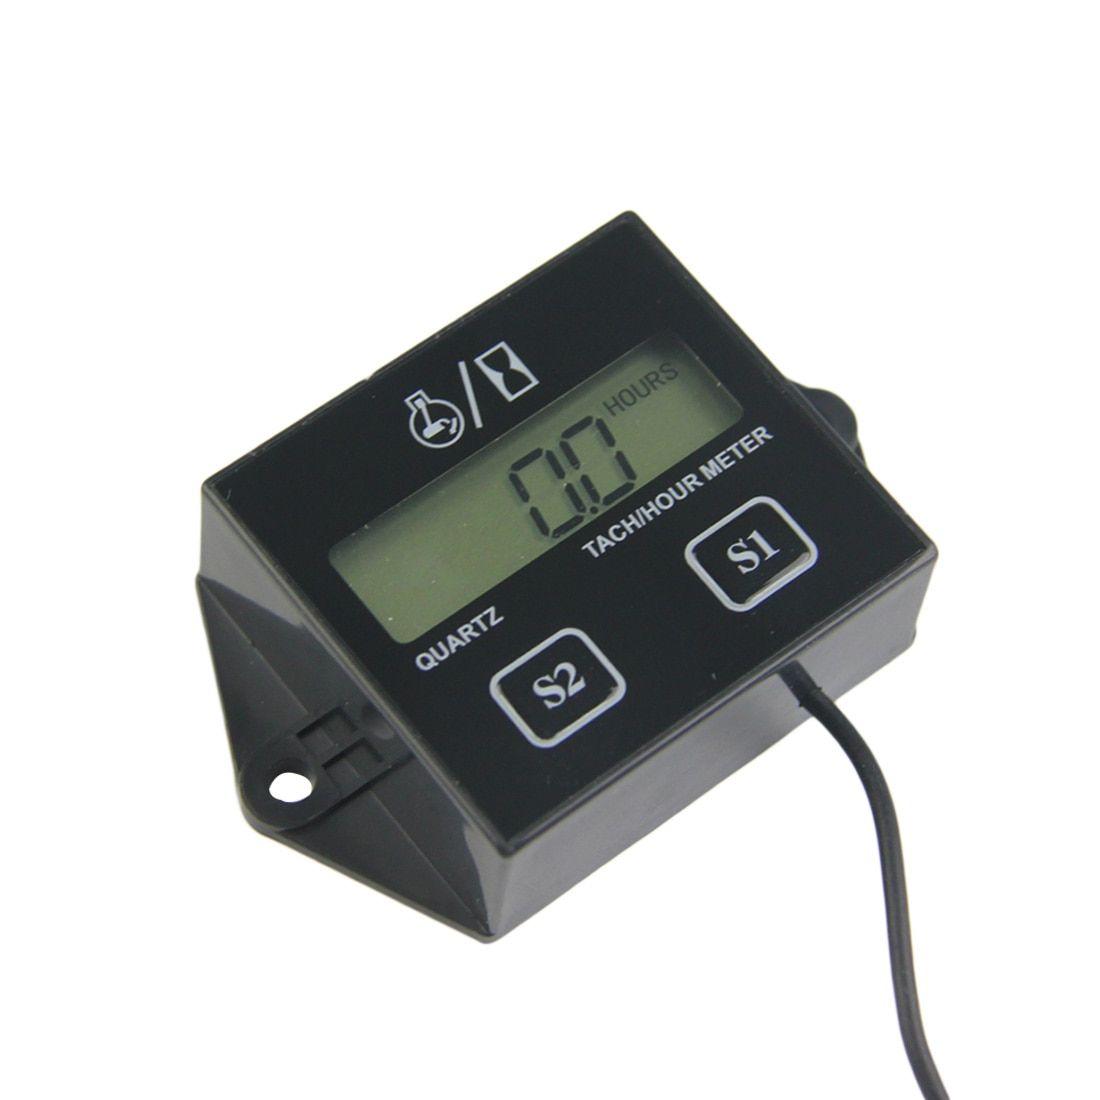 Best Price Engine Spark Tech Hour Meter Digital Engine Tachometer